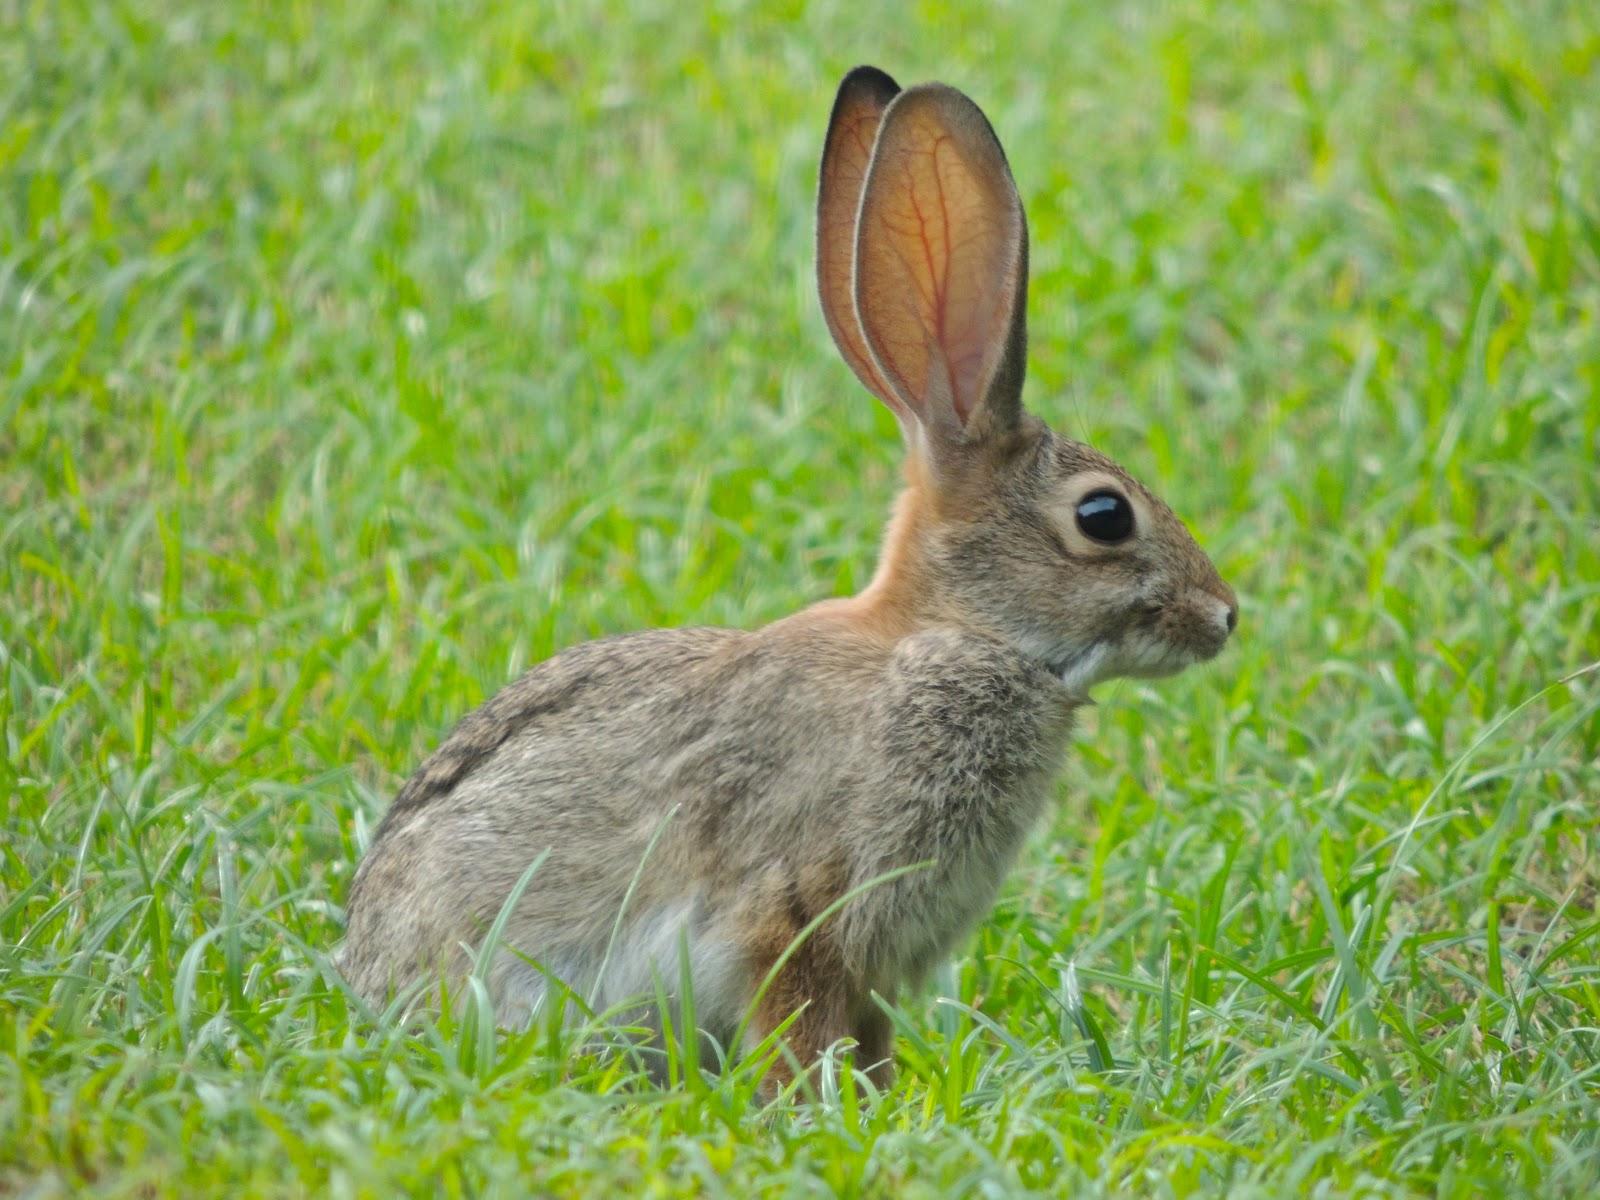 Scottsdale Daily Photo: Photo: Backyard bunny